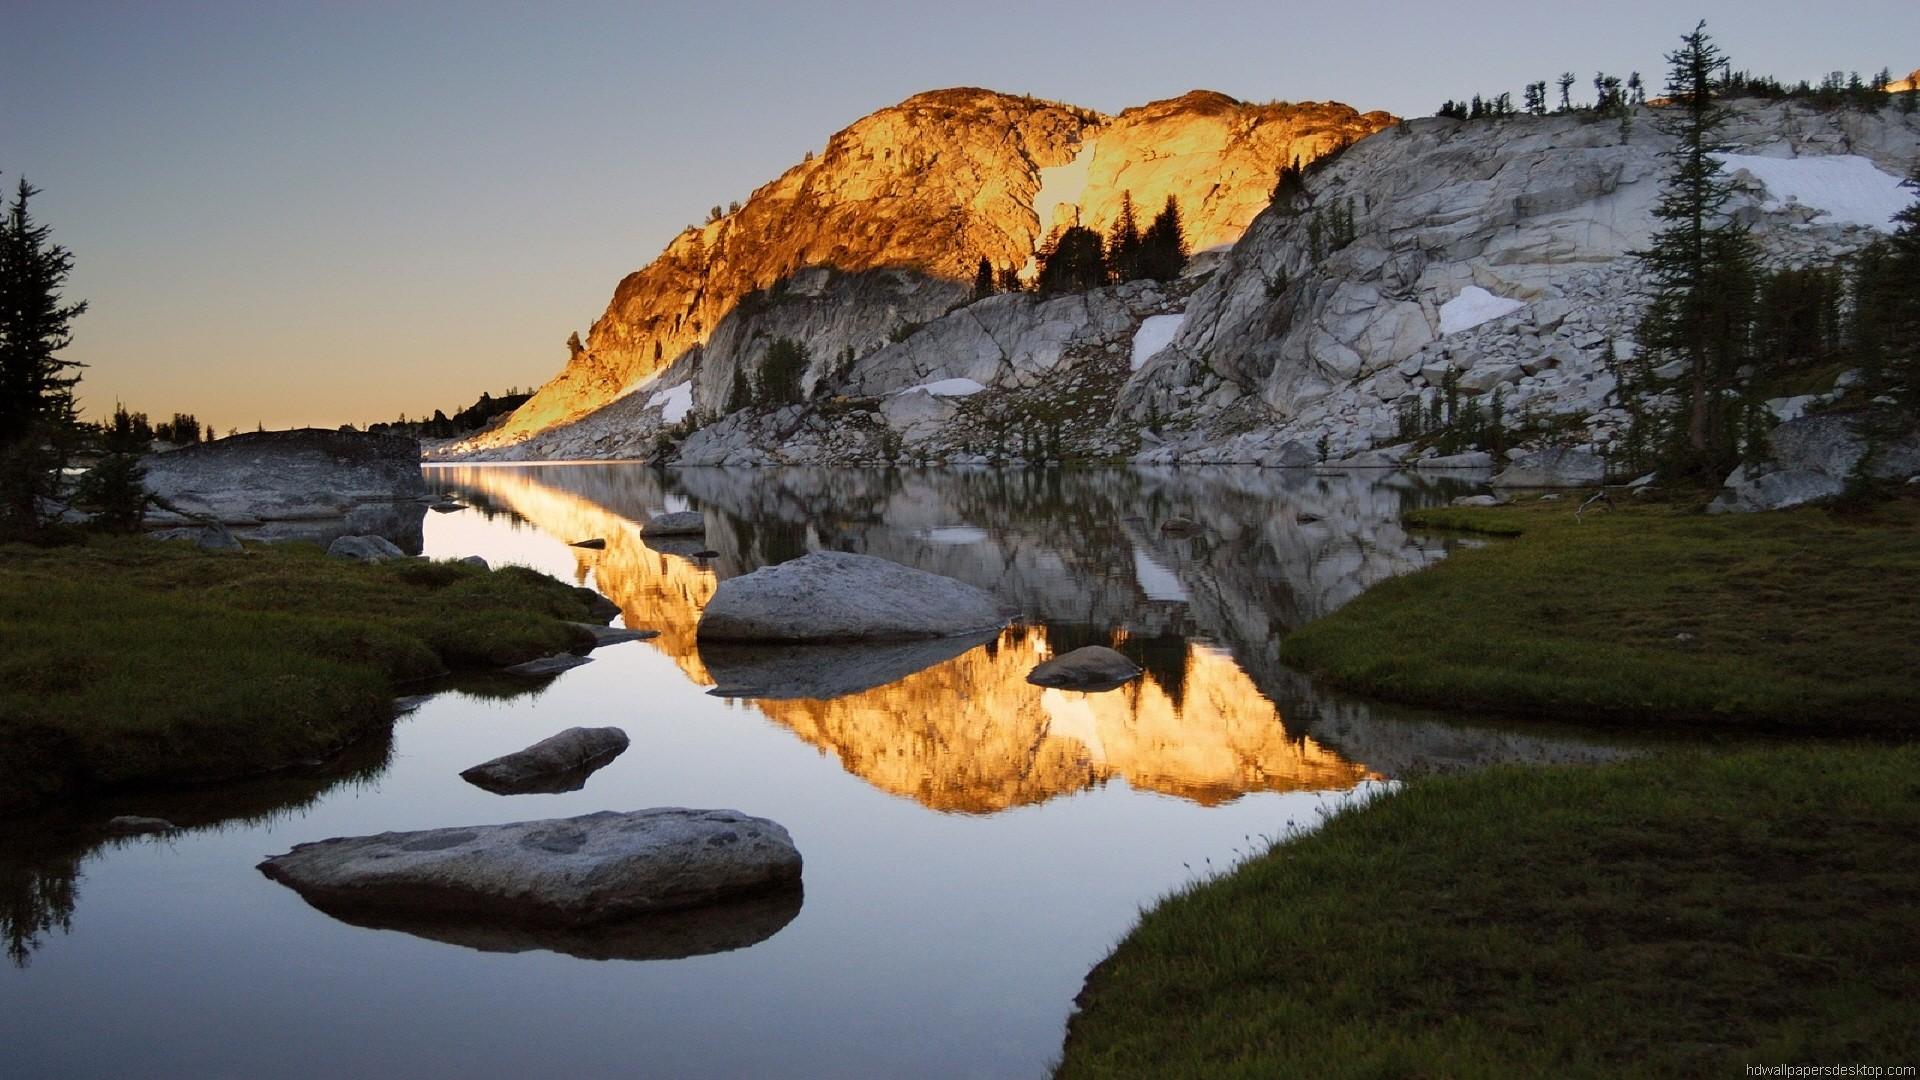 … Nature-Green-HD-Wallpapers-1080p-6 Wallpaper Hd 1080P Nature  …